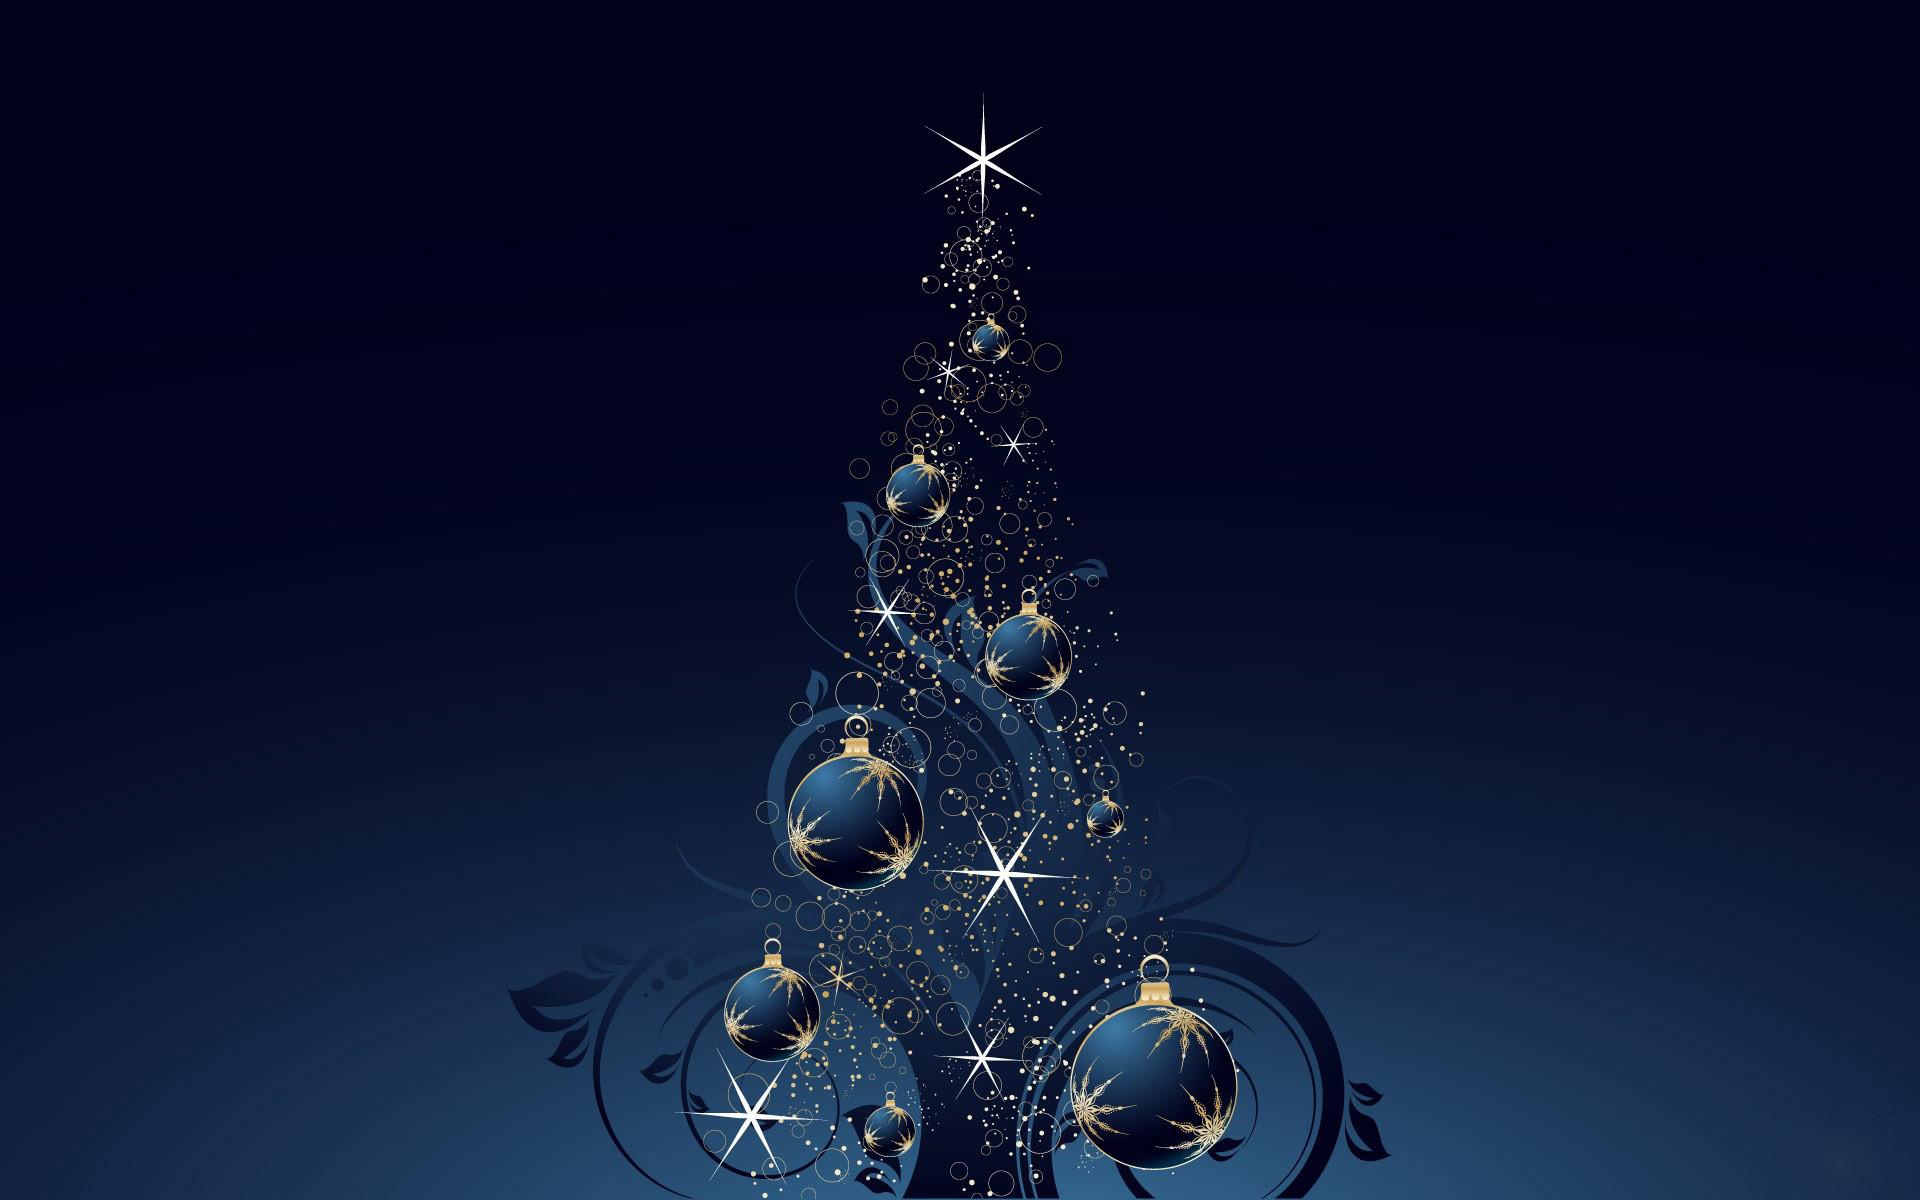 Windows Christmas Wallpaper